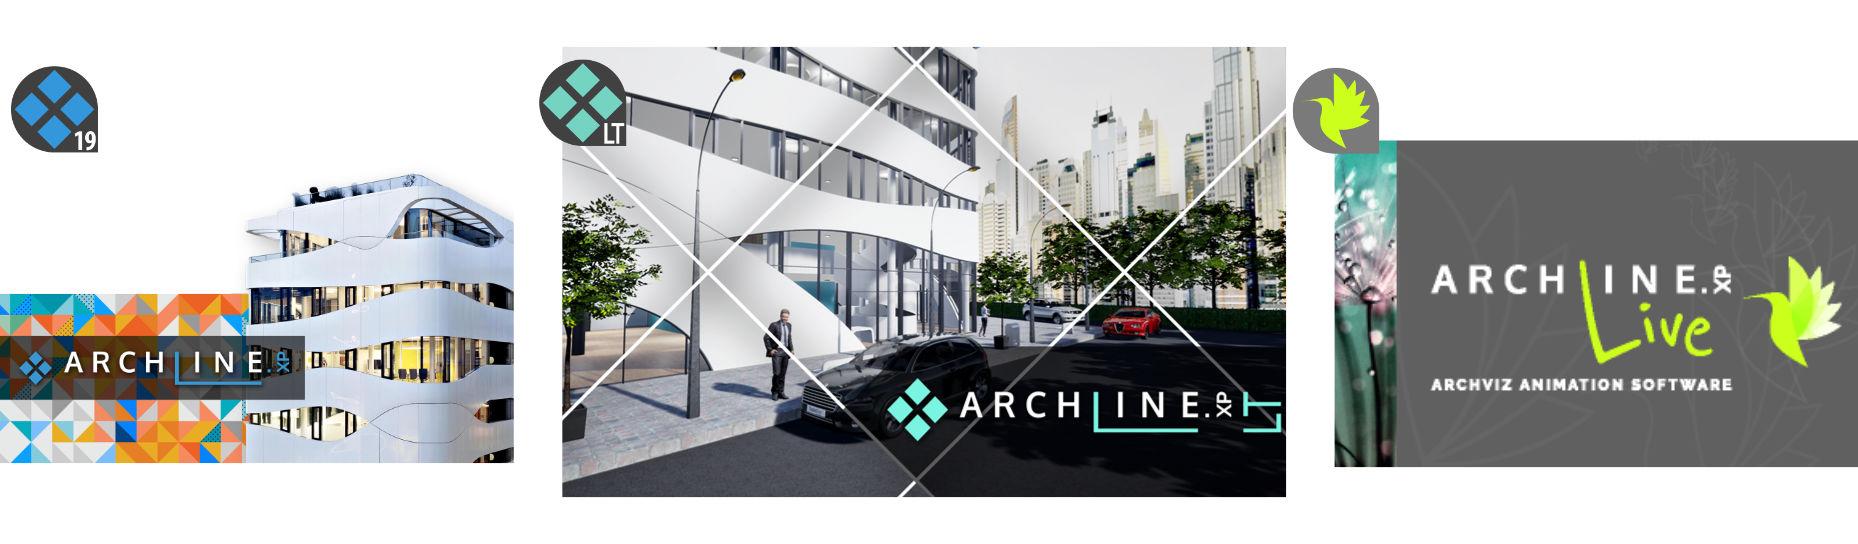 ARCHLine.XP LT - PRO + LIVE 2019